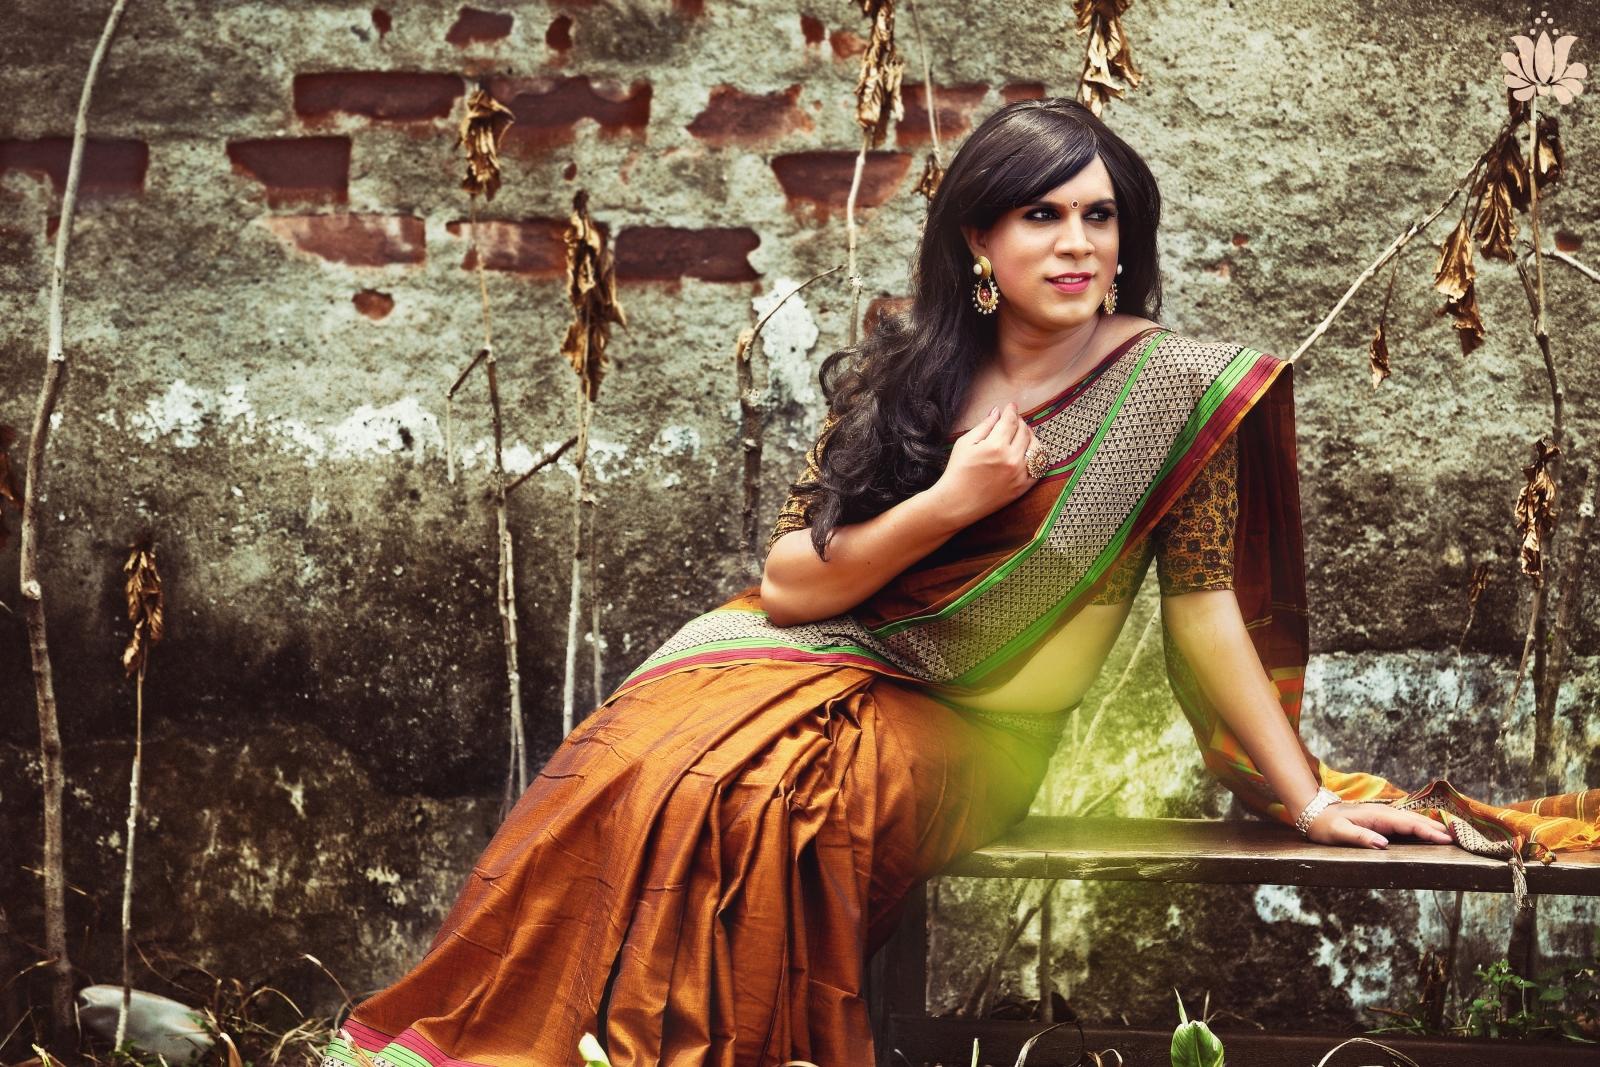 Red Lotus transgender fashion campaign